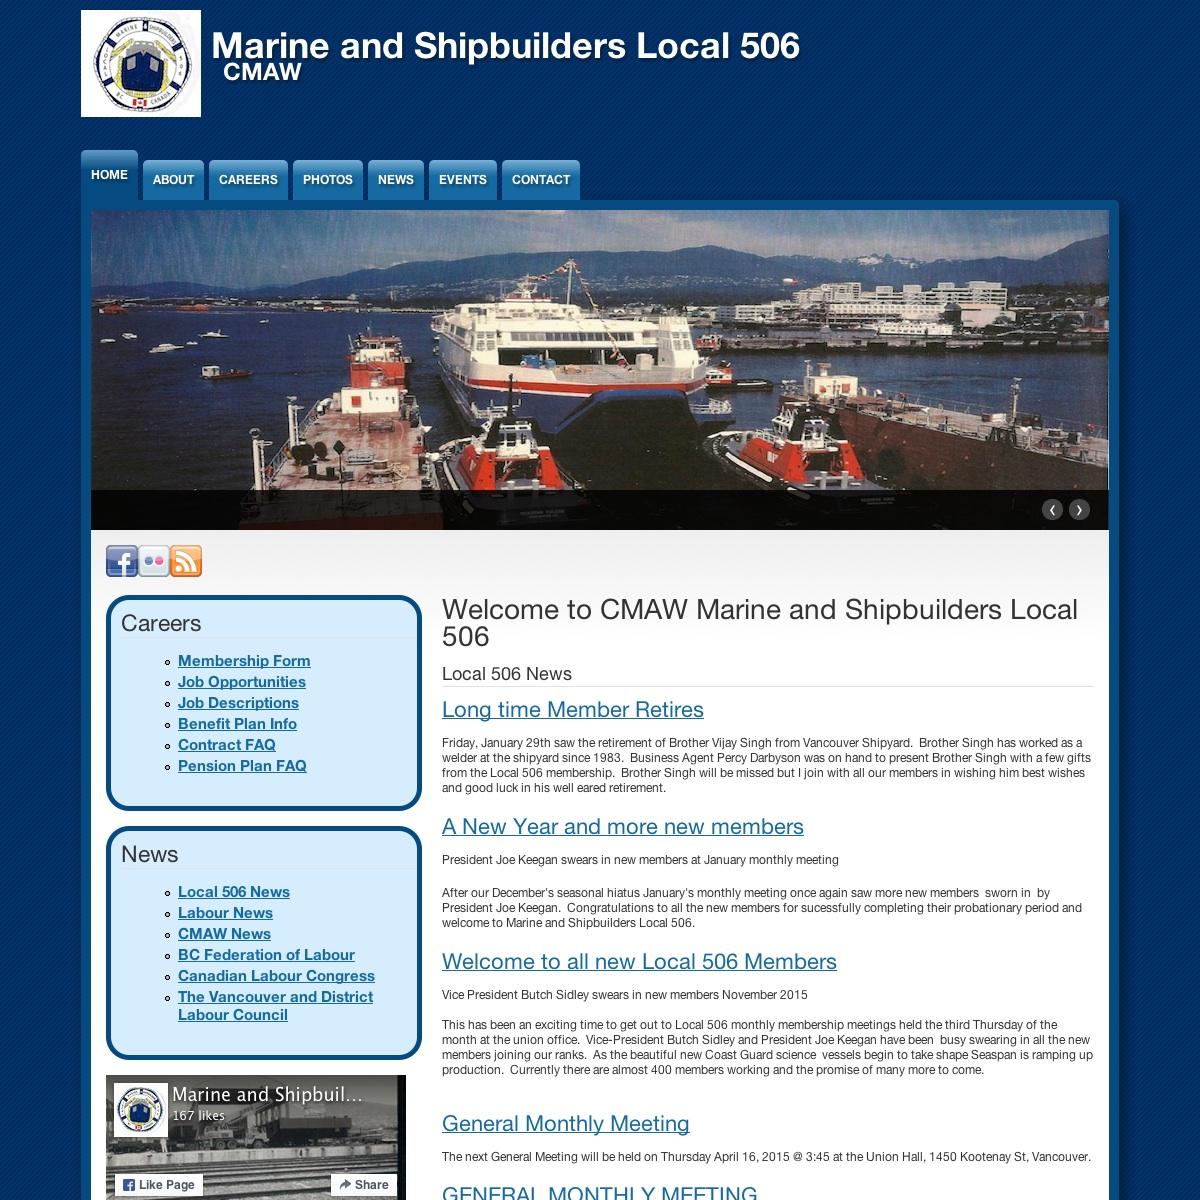 Marine and Shipbuilders Local 506